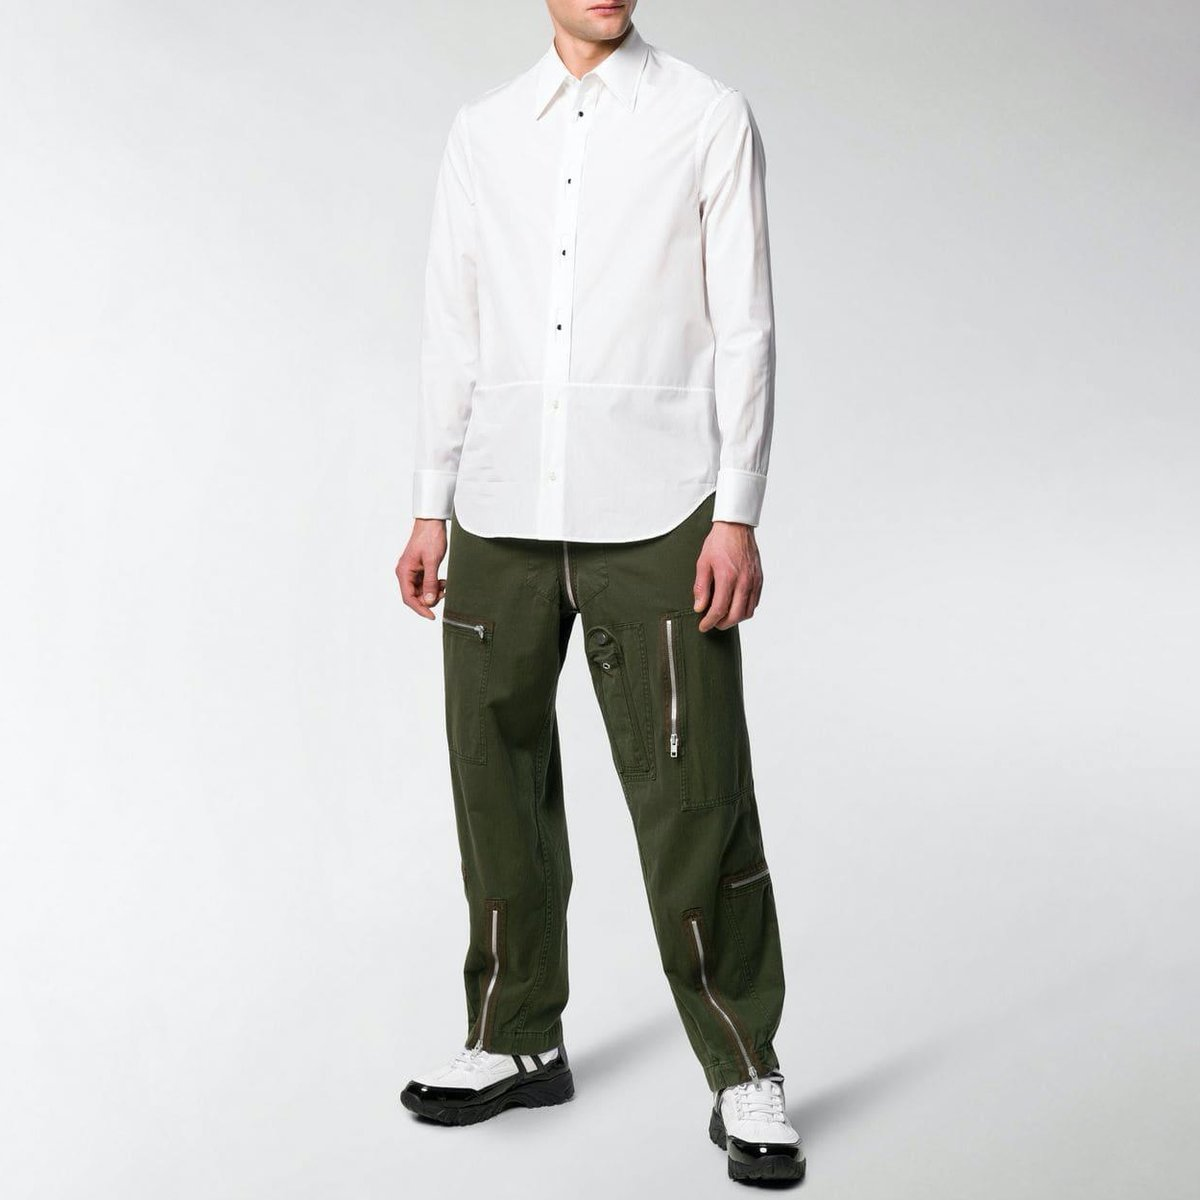 maison-martin-margiela-100-WHITE-Concealed-Button-Shirt (1).jpg